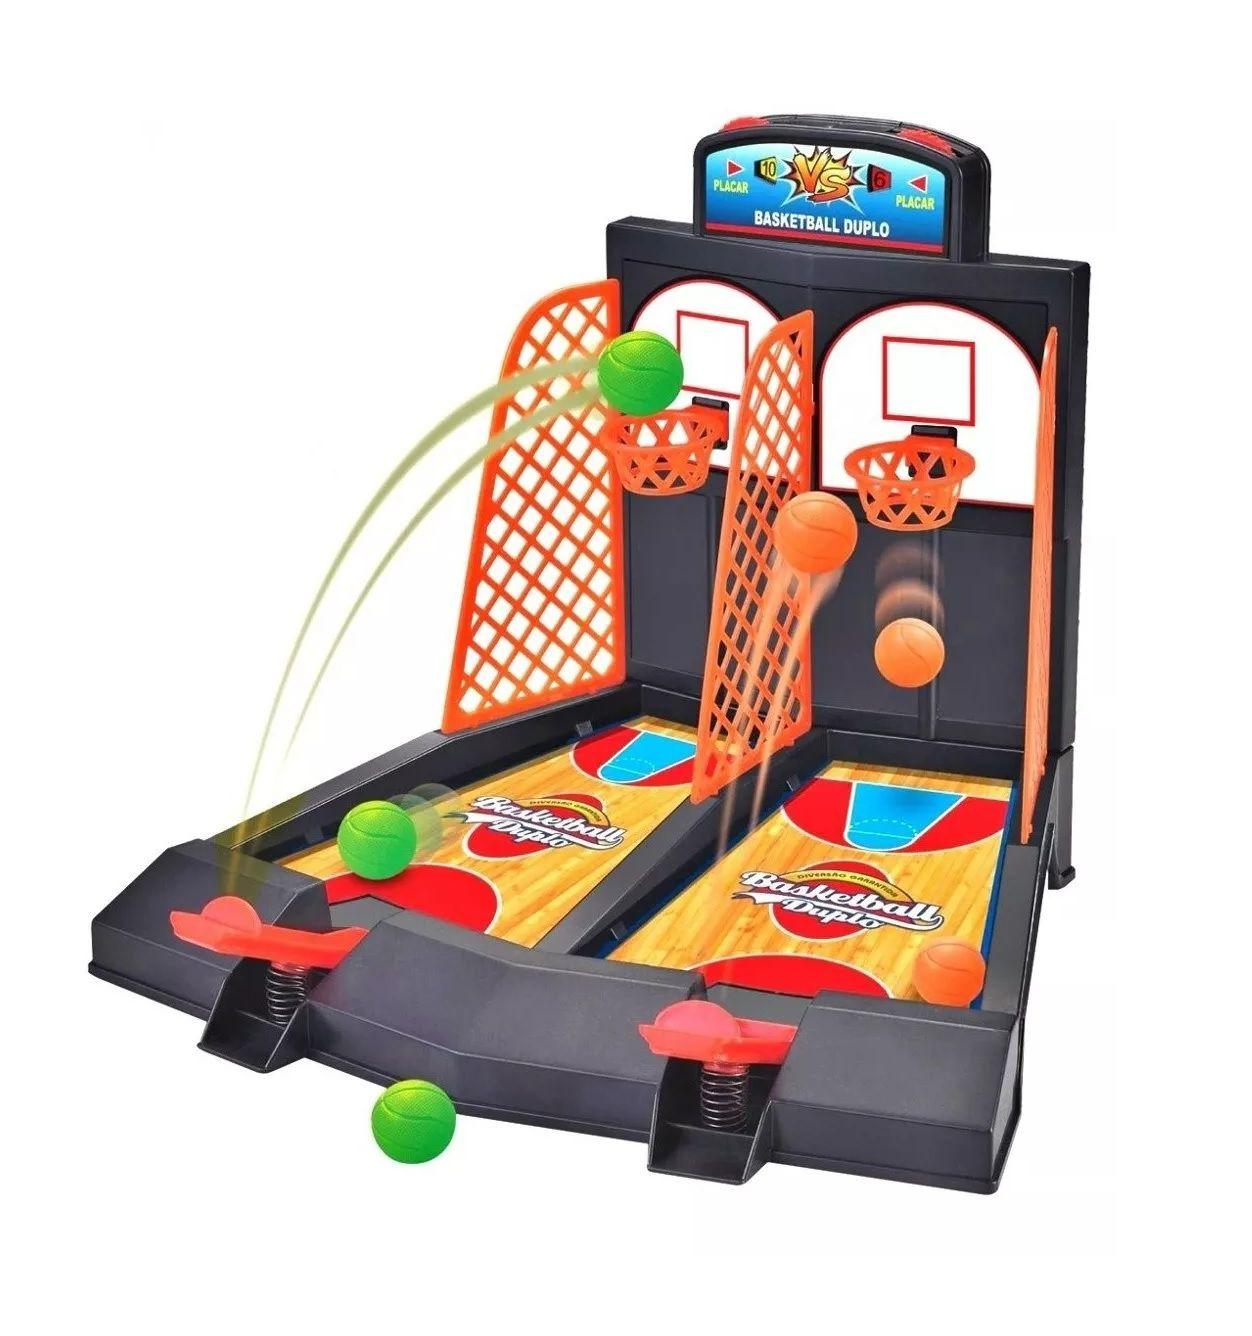 Jogo Basketball Duplo Radical - Braskit